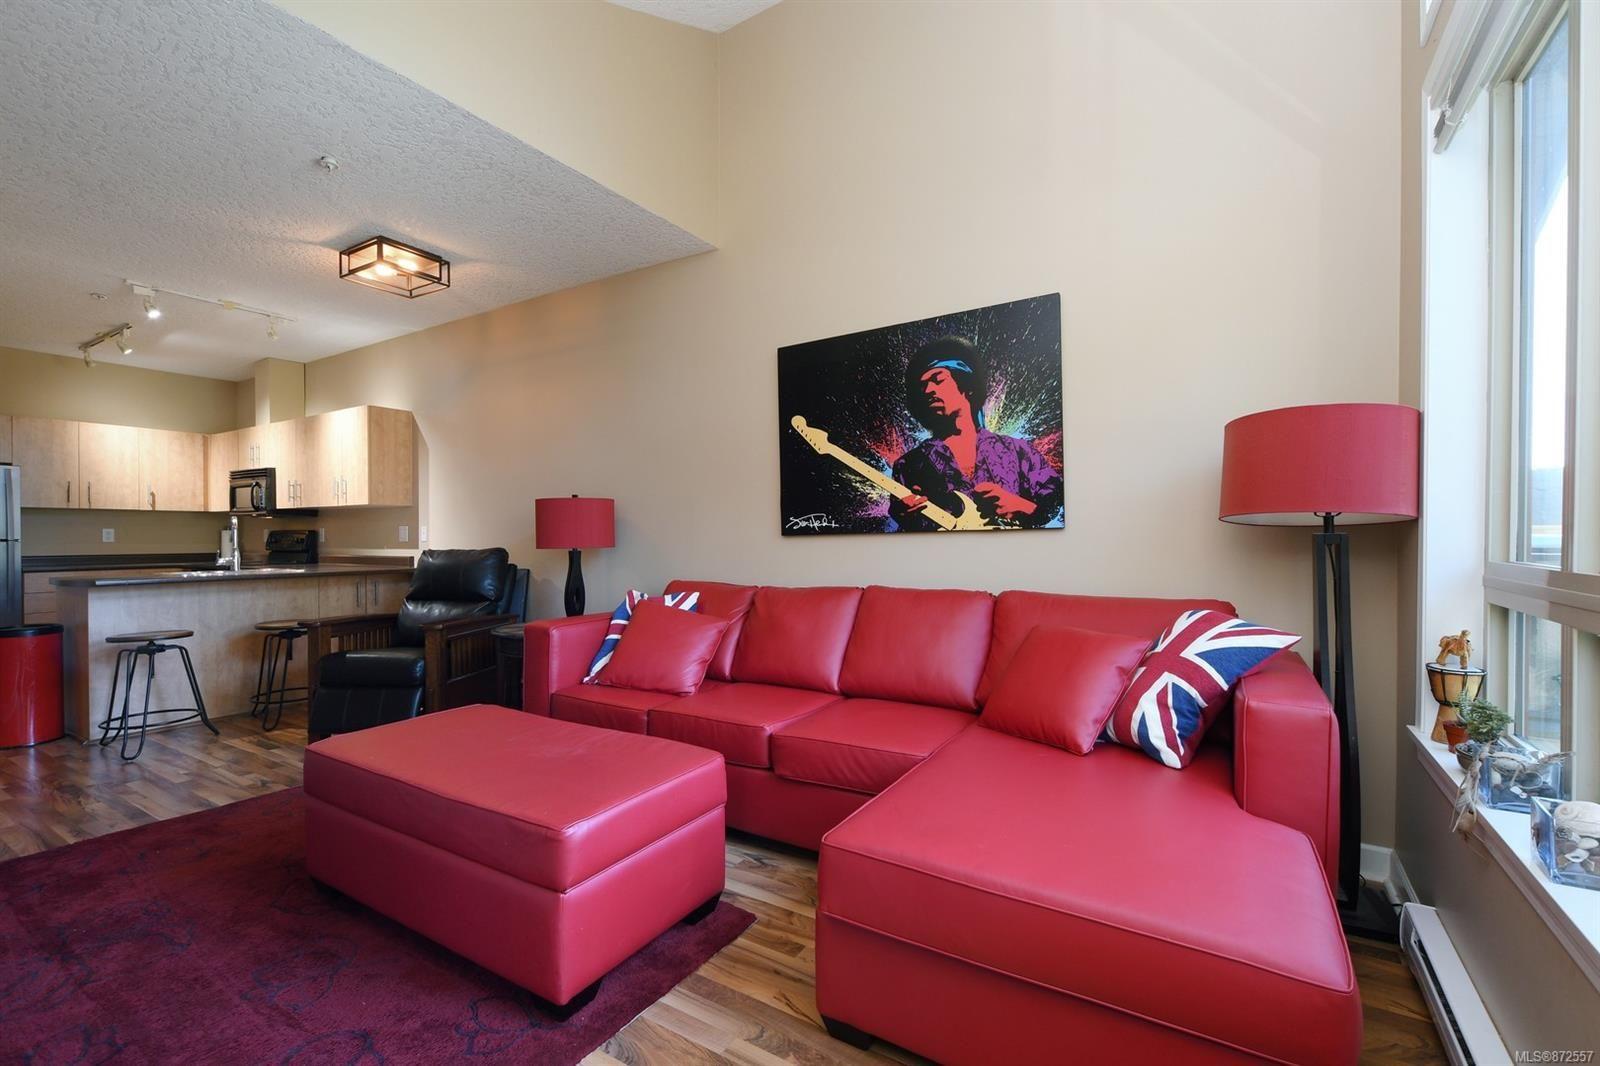 Photo 3: Photos: 411 825 Goldstream Ave in : La Langford Proper Condo for sale (Langford)  : MLS®# 872557